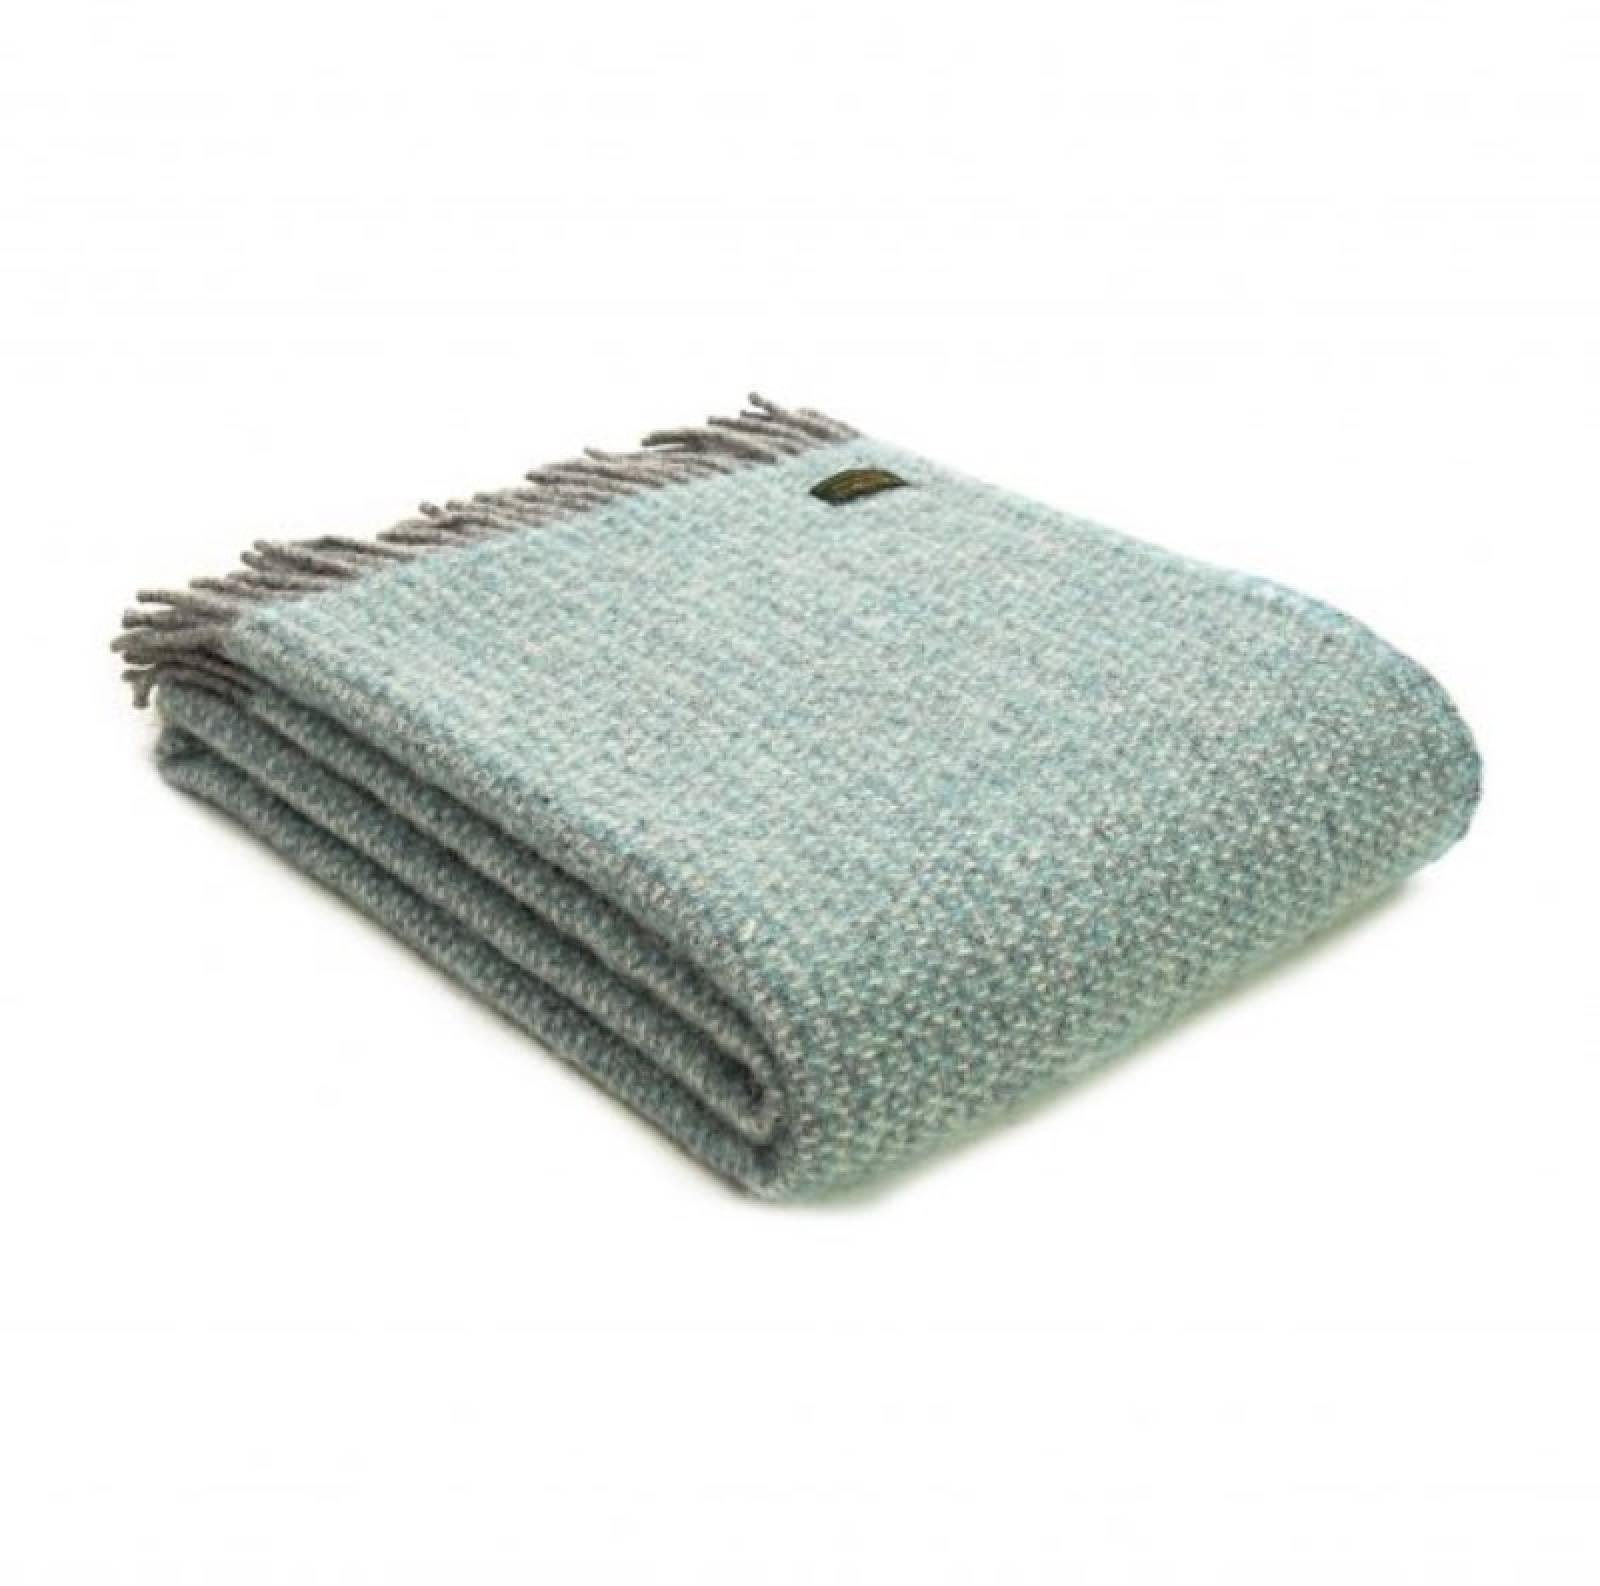 Illusion Spearmint & Grey Wool Knee Blanket 70x183cm